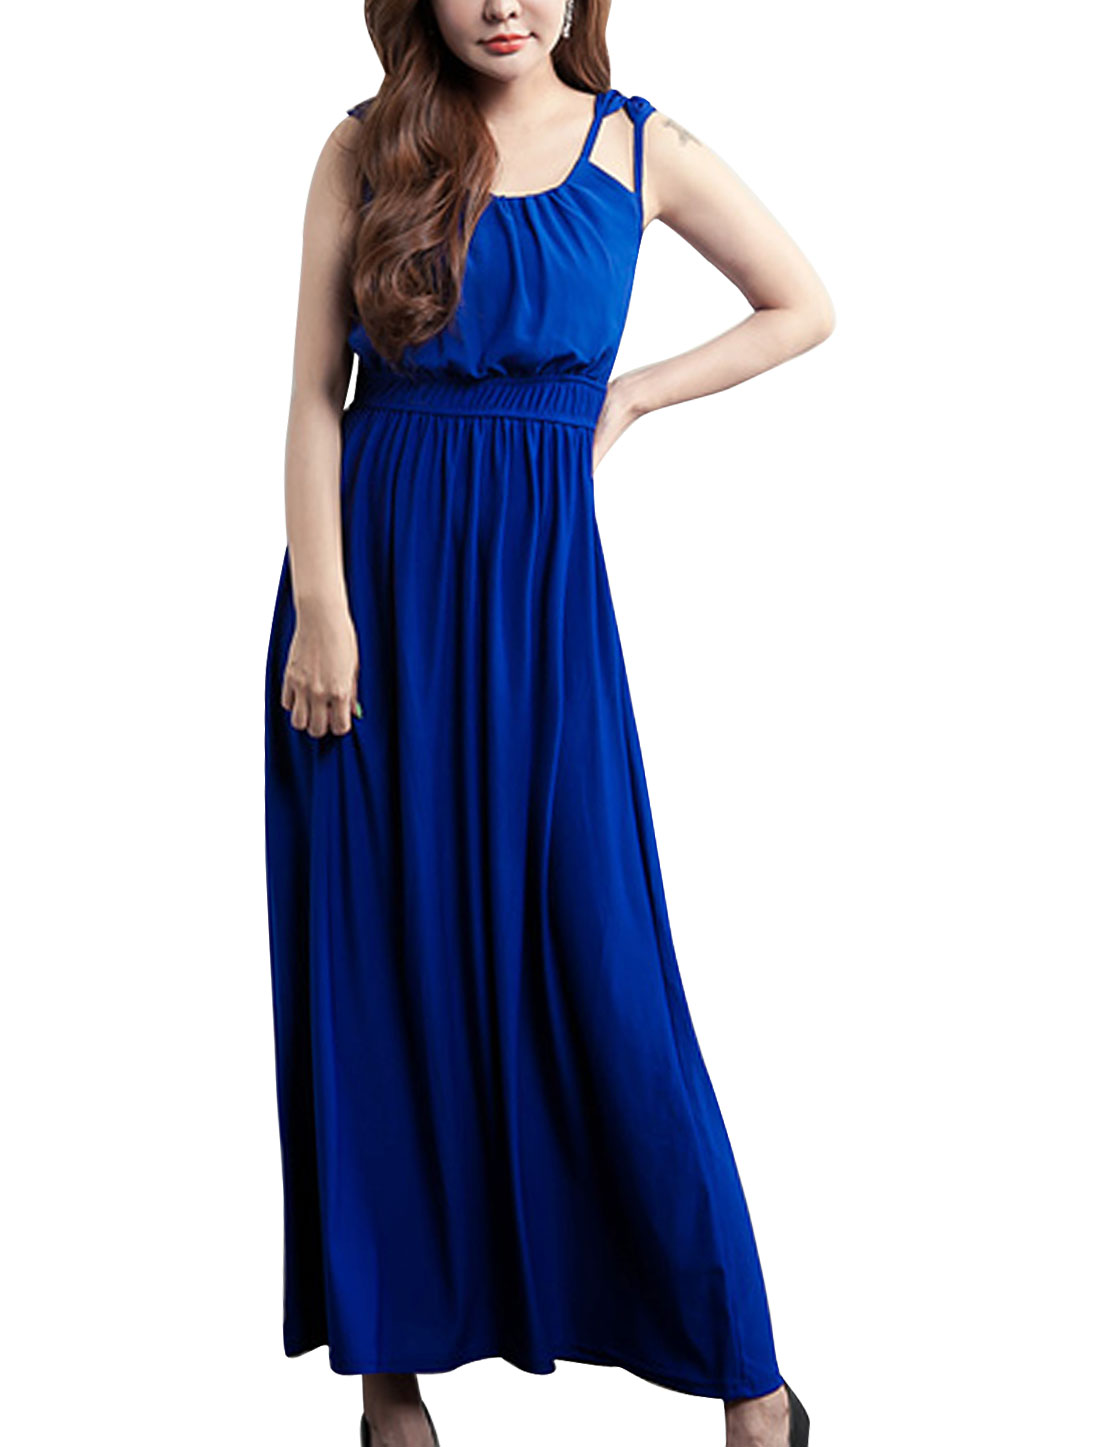 Lady Double Spaghetti Strap Elastic Waist Slim Fit Blouson Dress Blue M